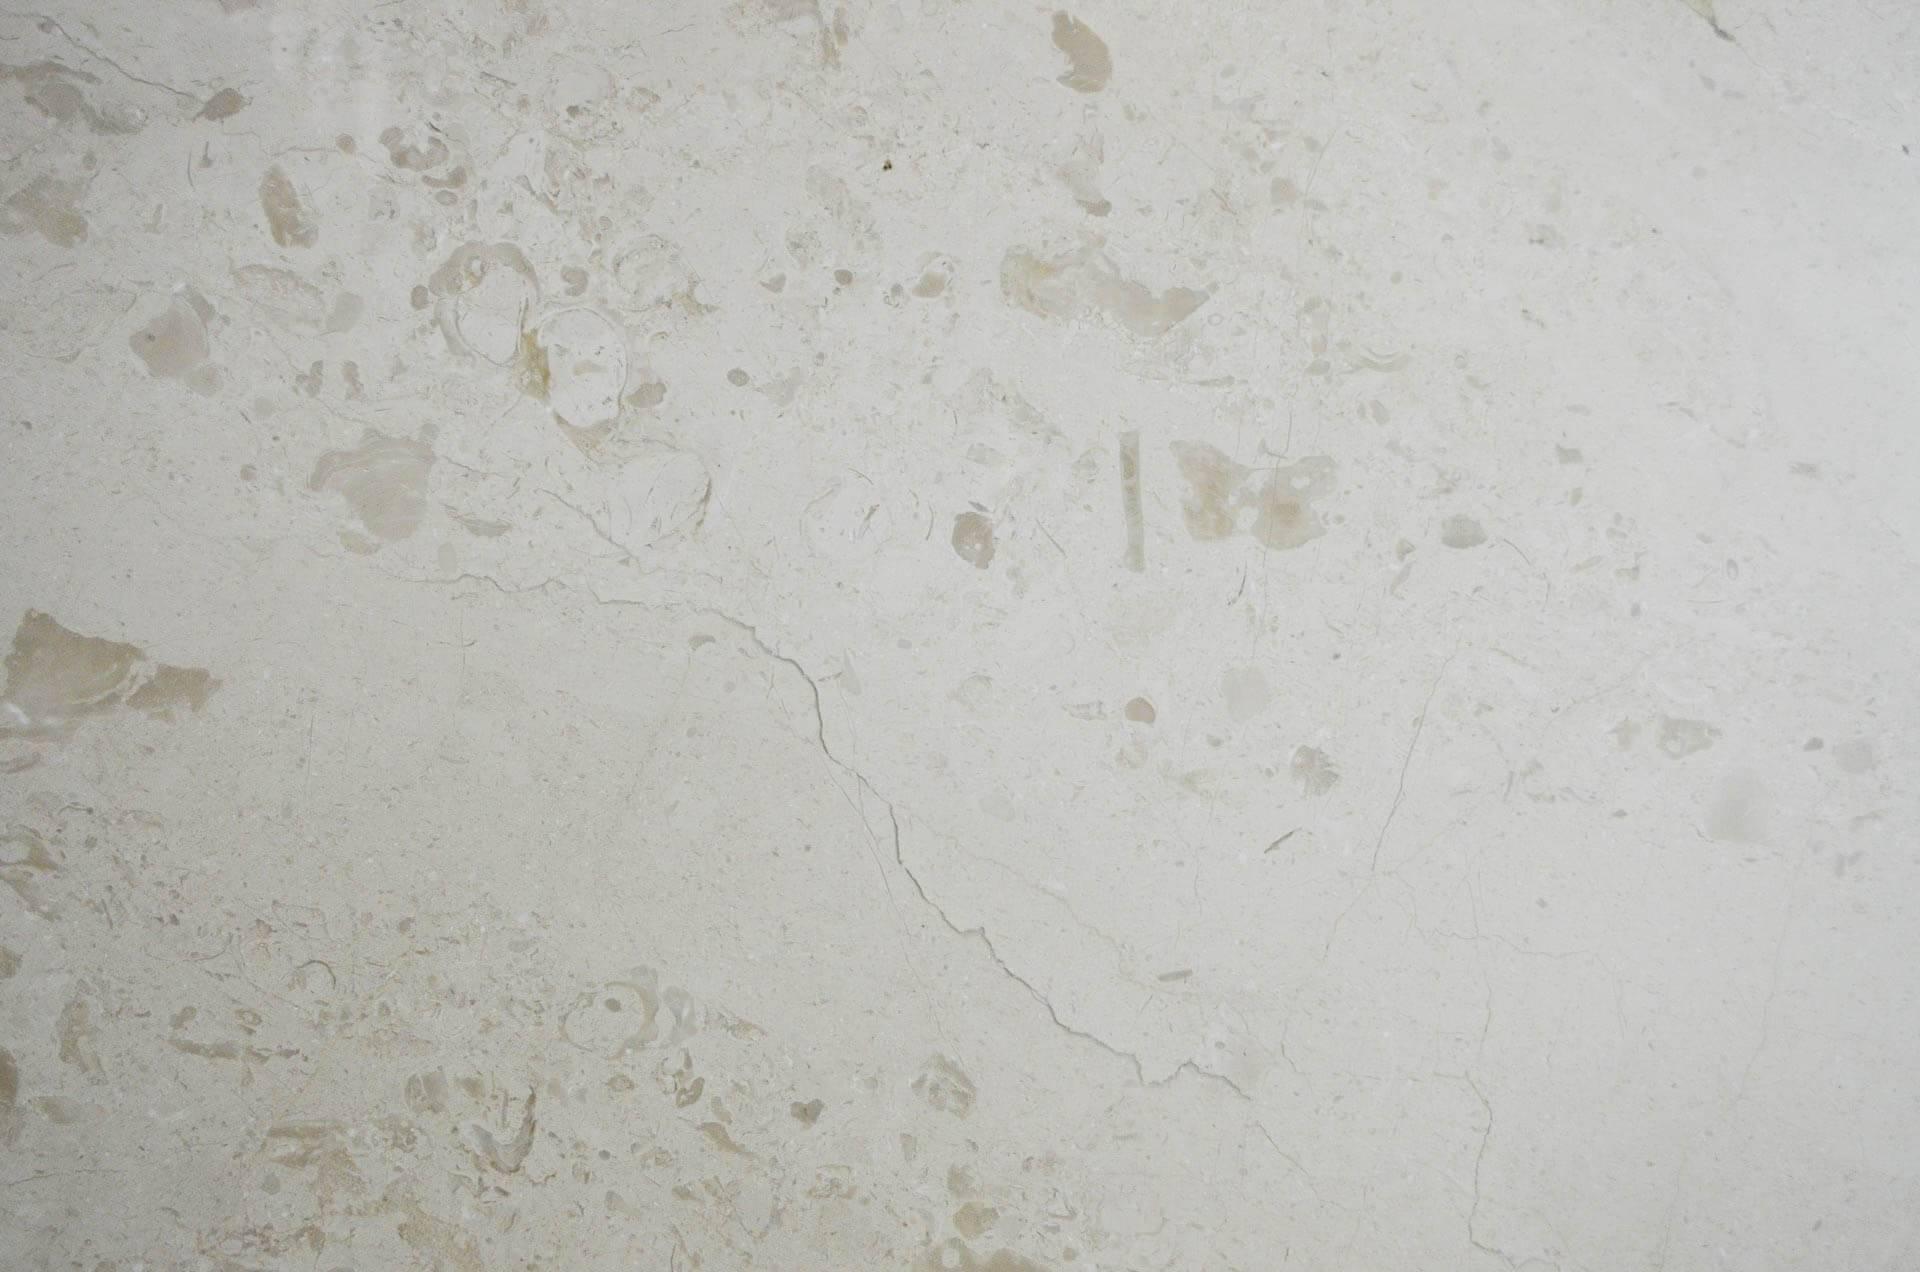 Crema Mare фото 1 — камень от Bevers Marmyr